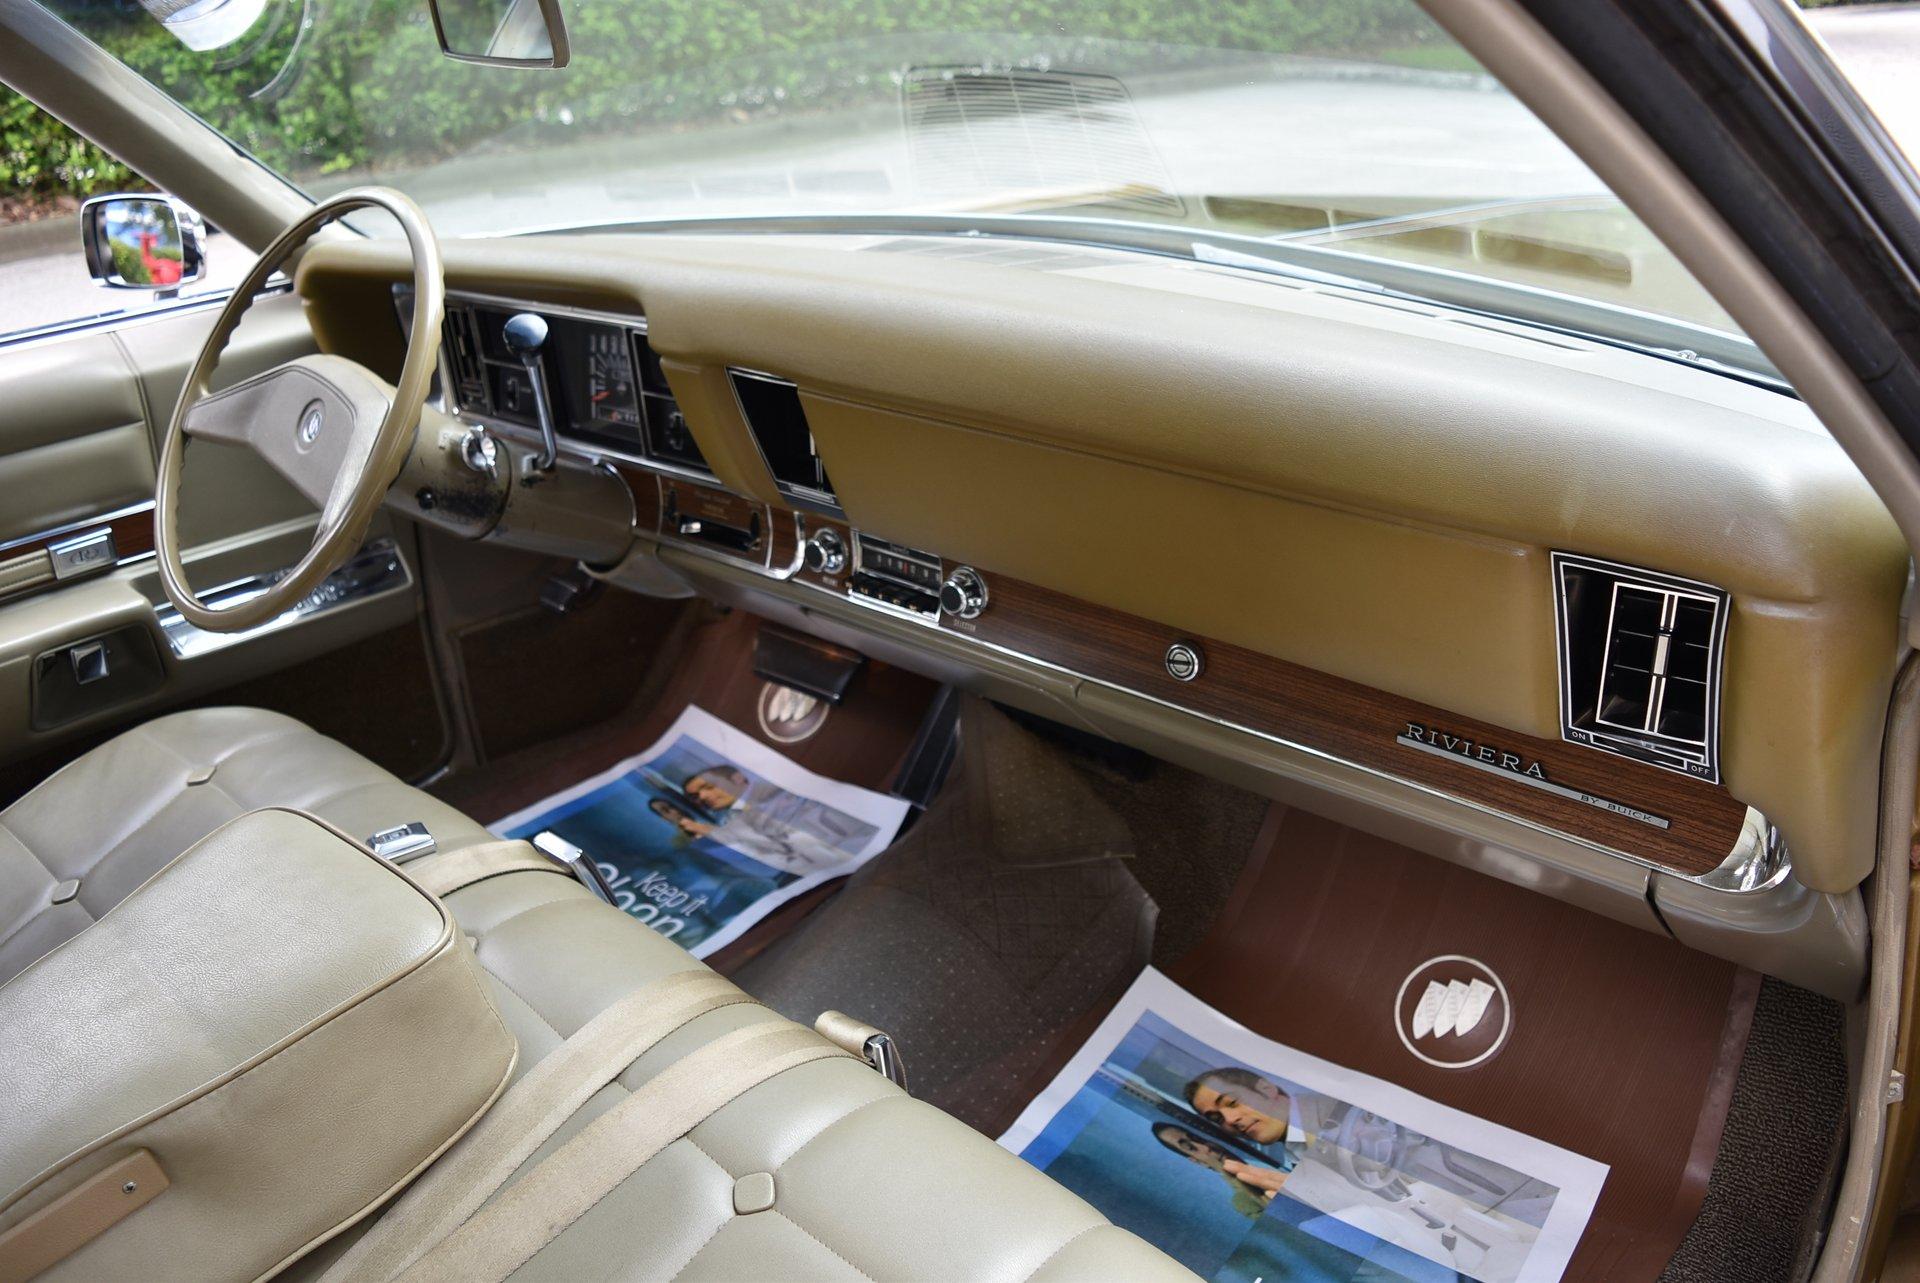 1969 buick riviera orlando classic cars 1969 buick riviera orlando classic cars